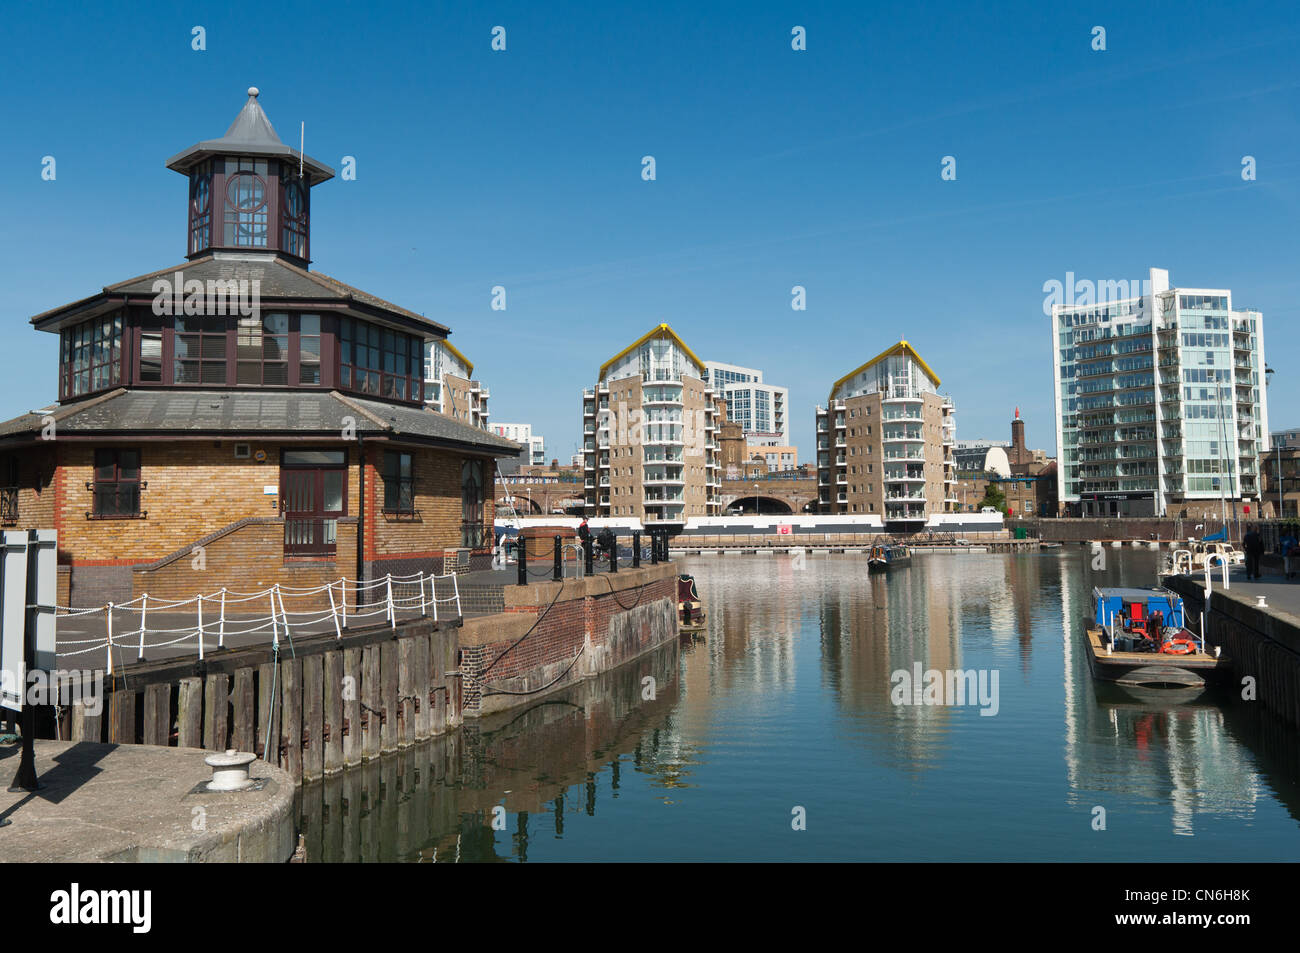 Modern apartments on Limehouse Basin, Tower Hamlets, London, England. - Stock Image